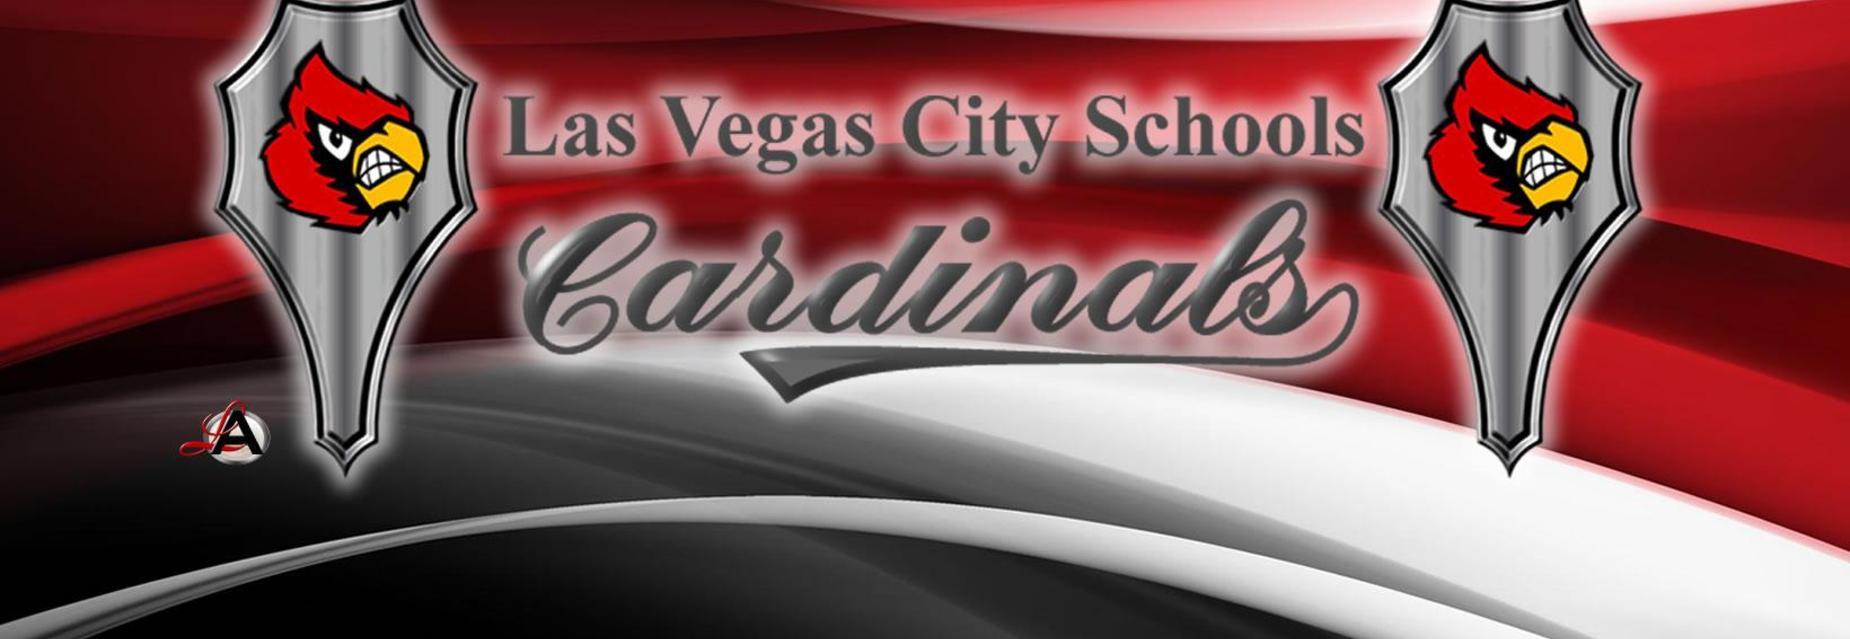 LVCS Banner